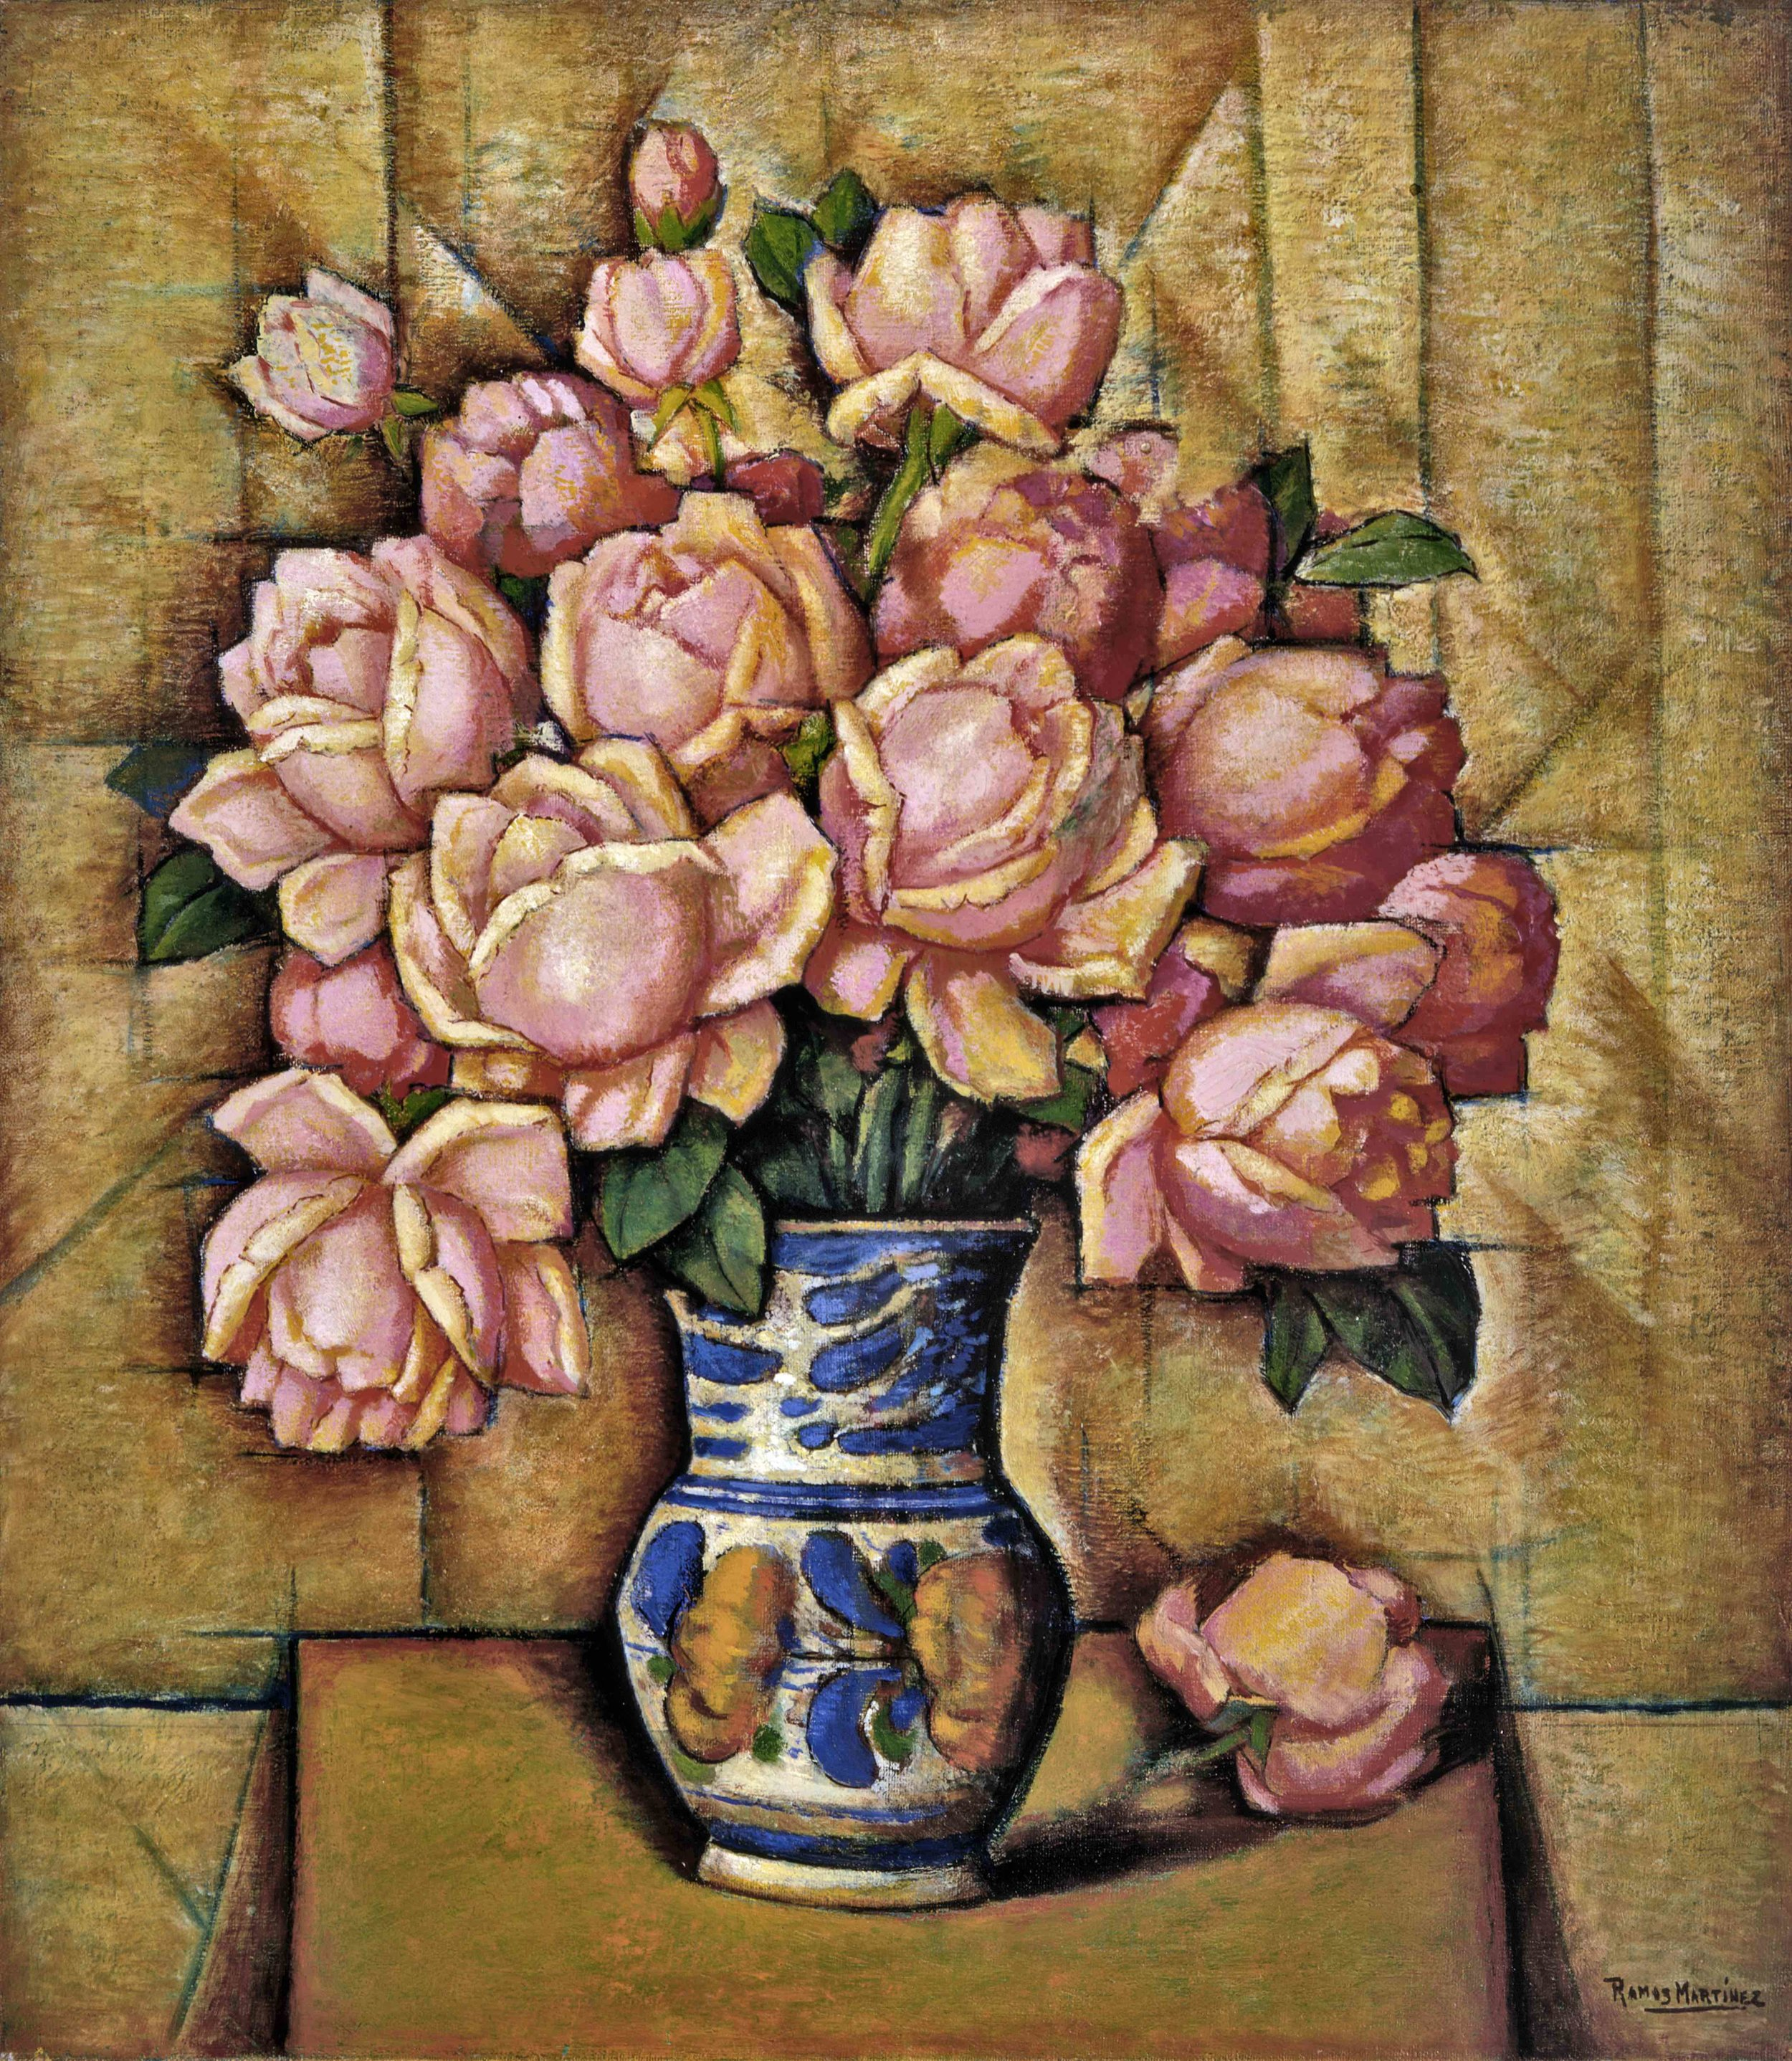 Rosas / Roses  ca. 1930 oil on canvas / óleo sobre tela 21.5 x 27.8 inches / 54.6 x 70.5 centímetros Private collection